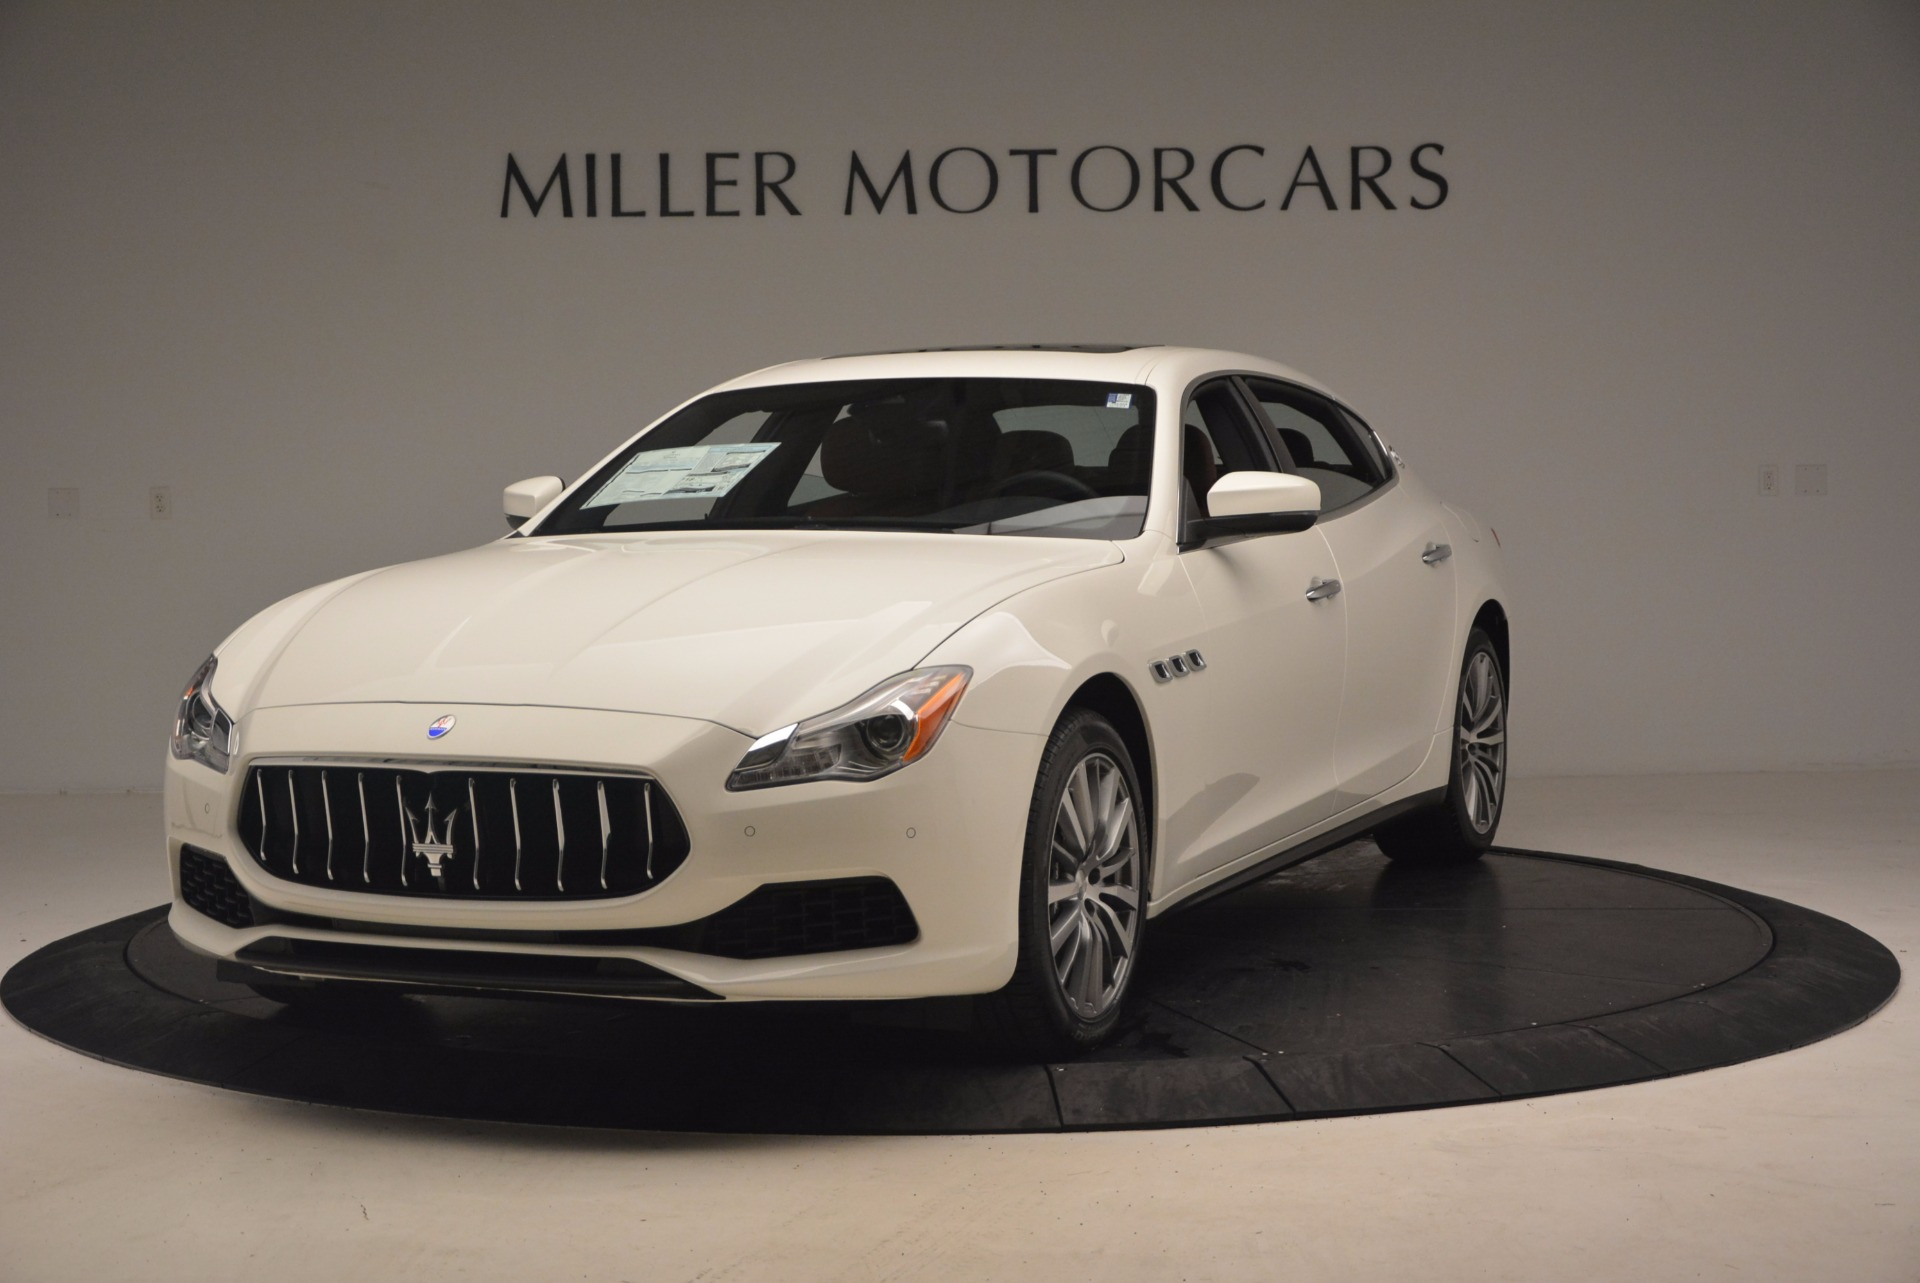 Used 2017 Maserati Quattroporte SQ4 for sale $53,900 at Rolls-Royce Motor Cars Greenwich in Greenwich CT 06830 1